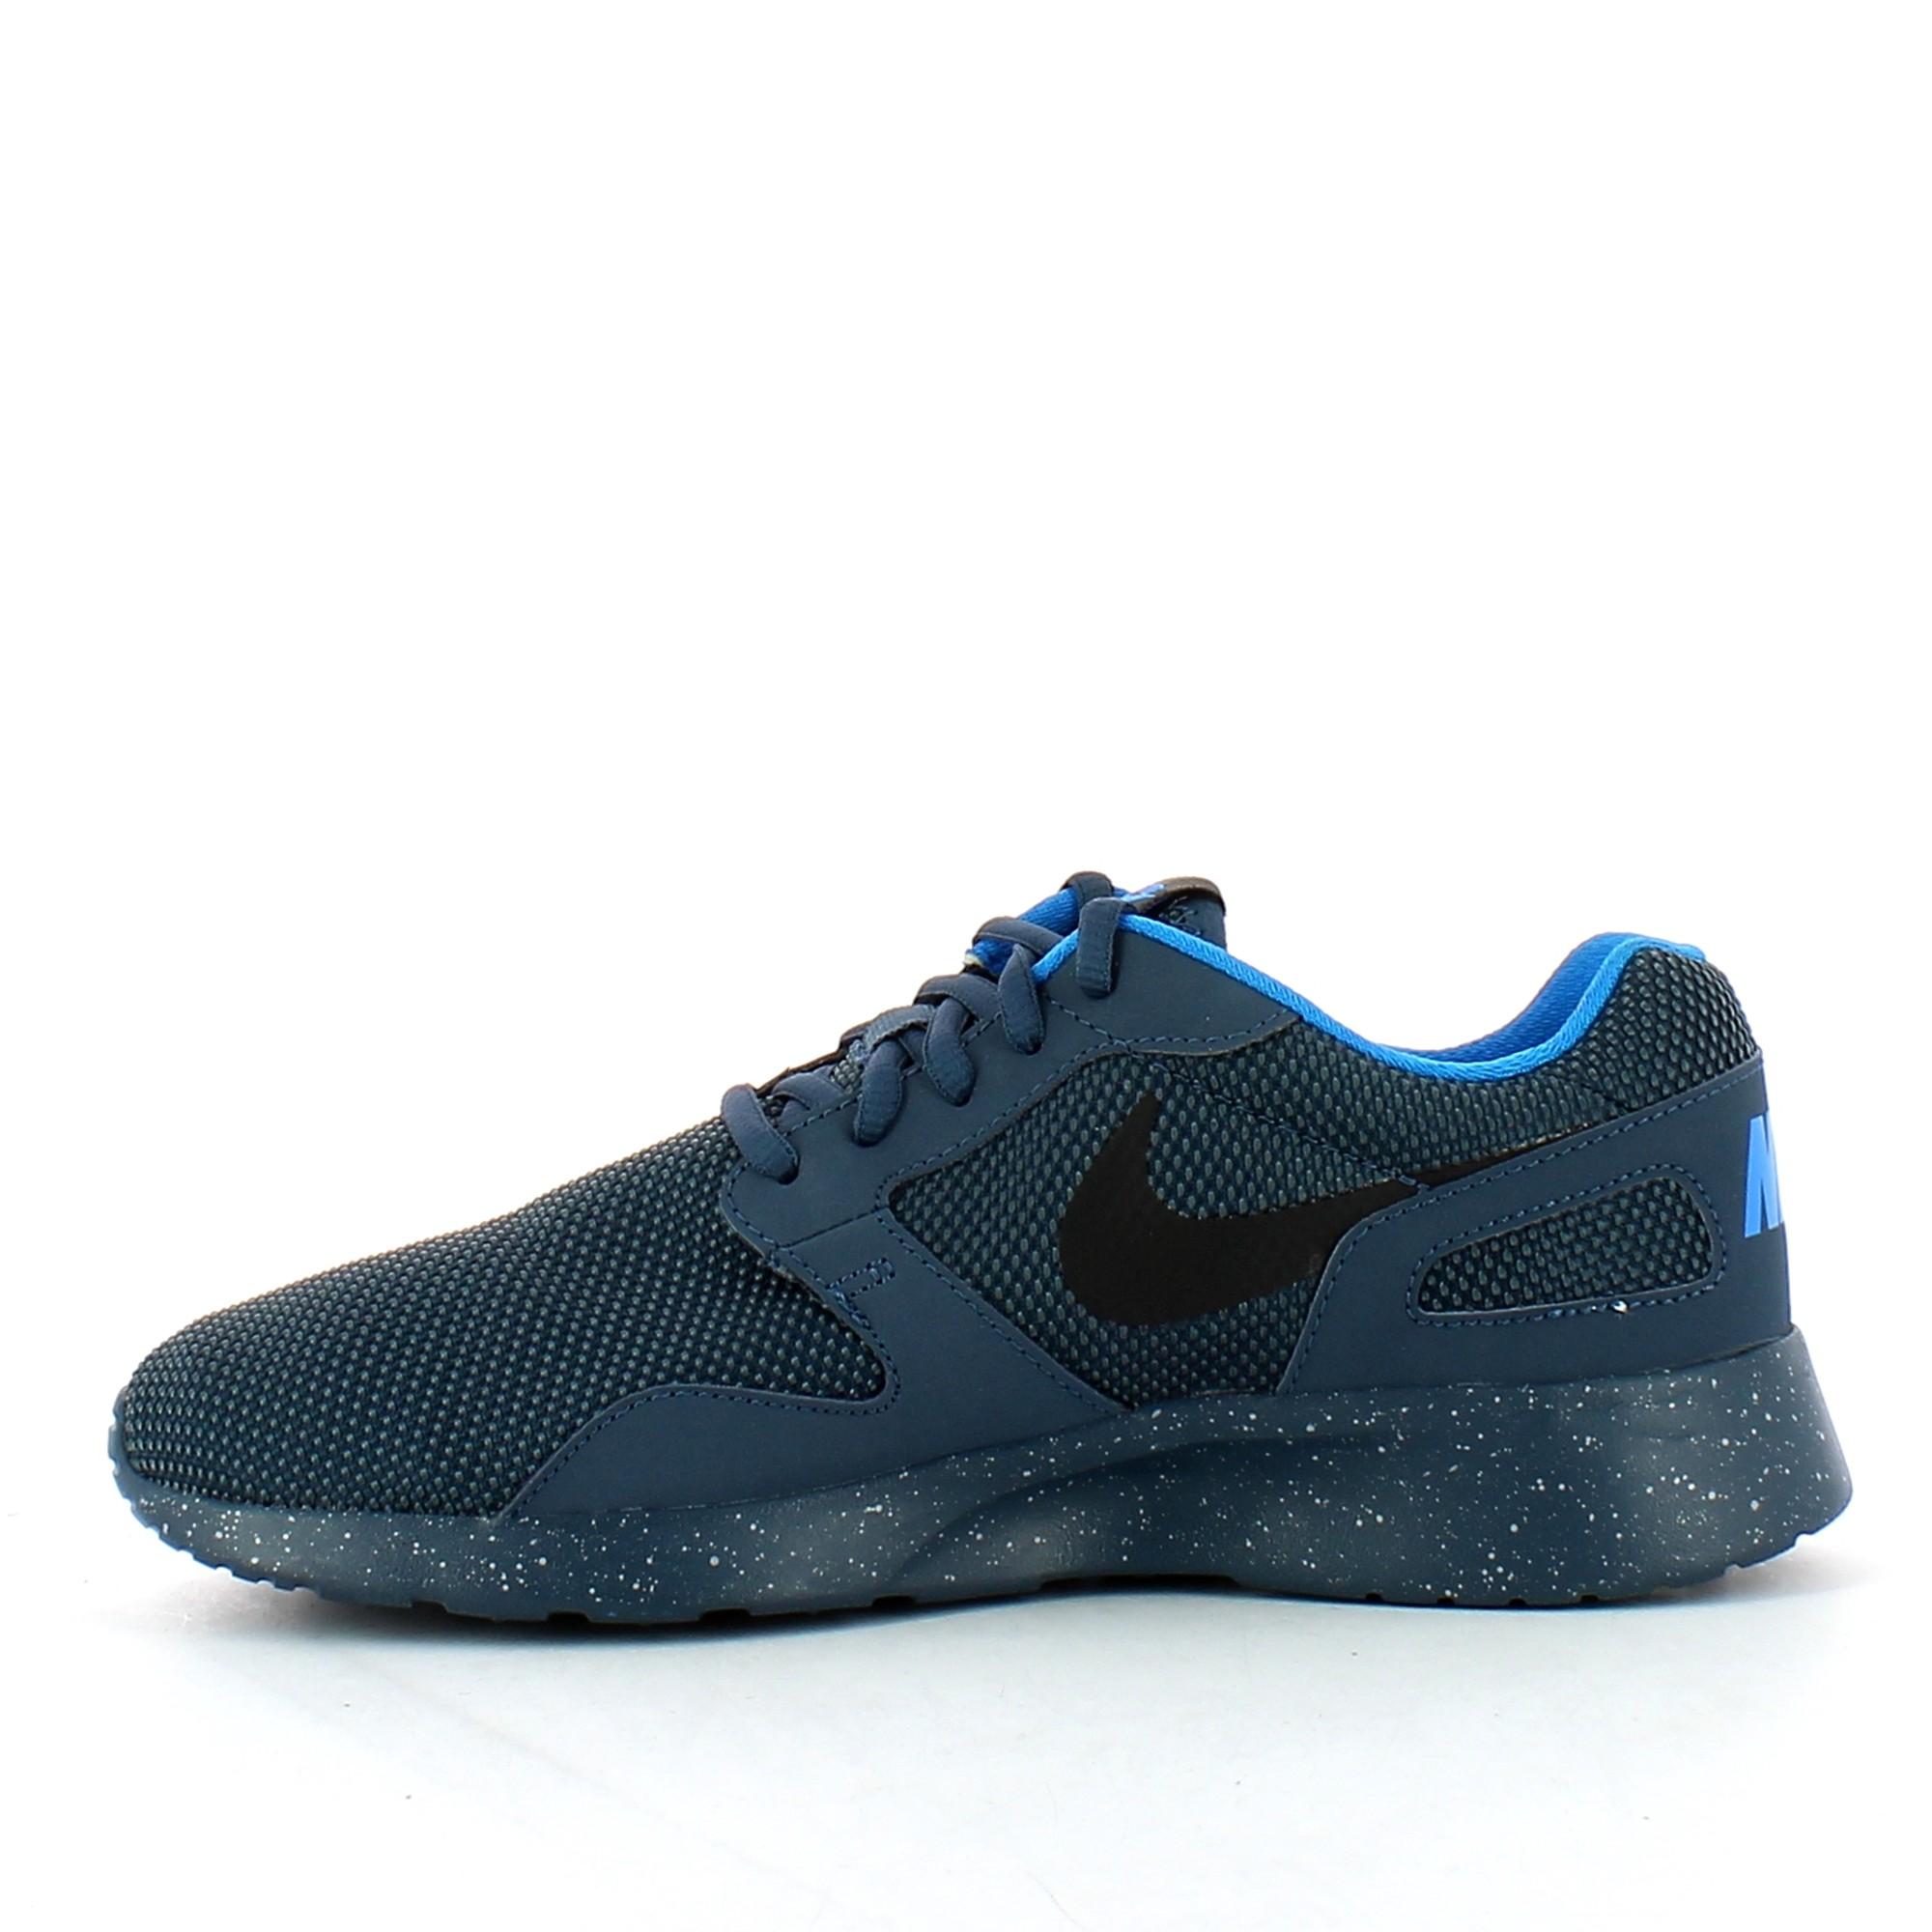 premium selection 66016 c2b2f Zapatillas Nike Kaishi Winter Azul Hombre - Deportes Moya